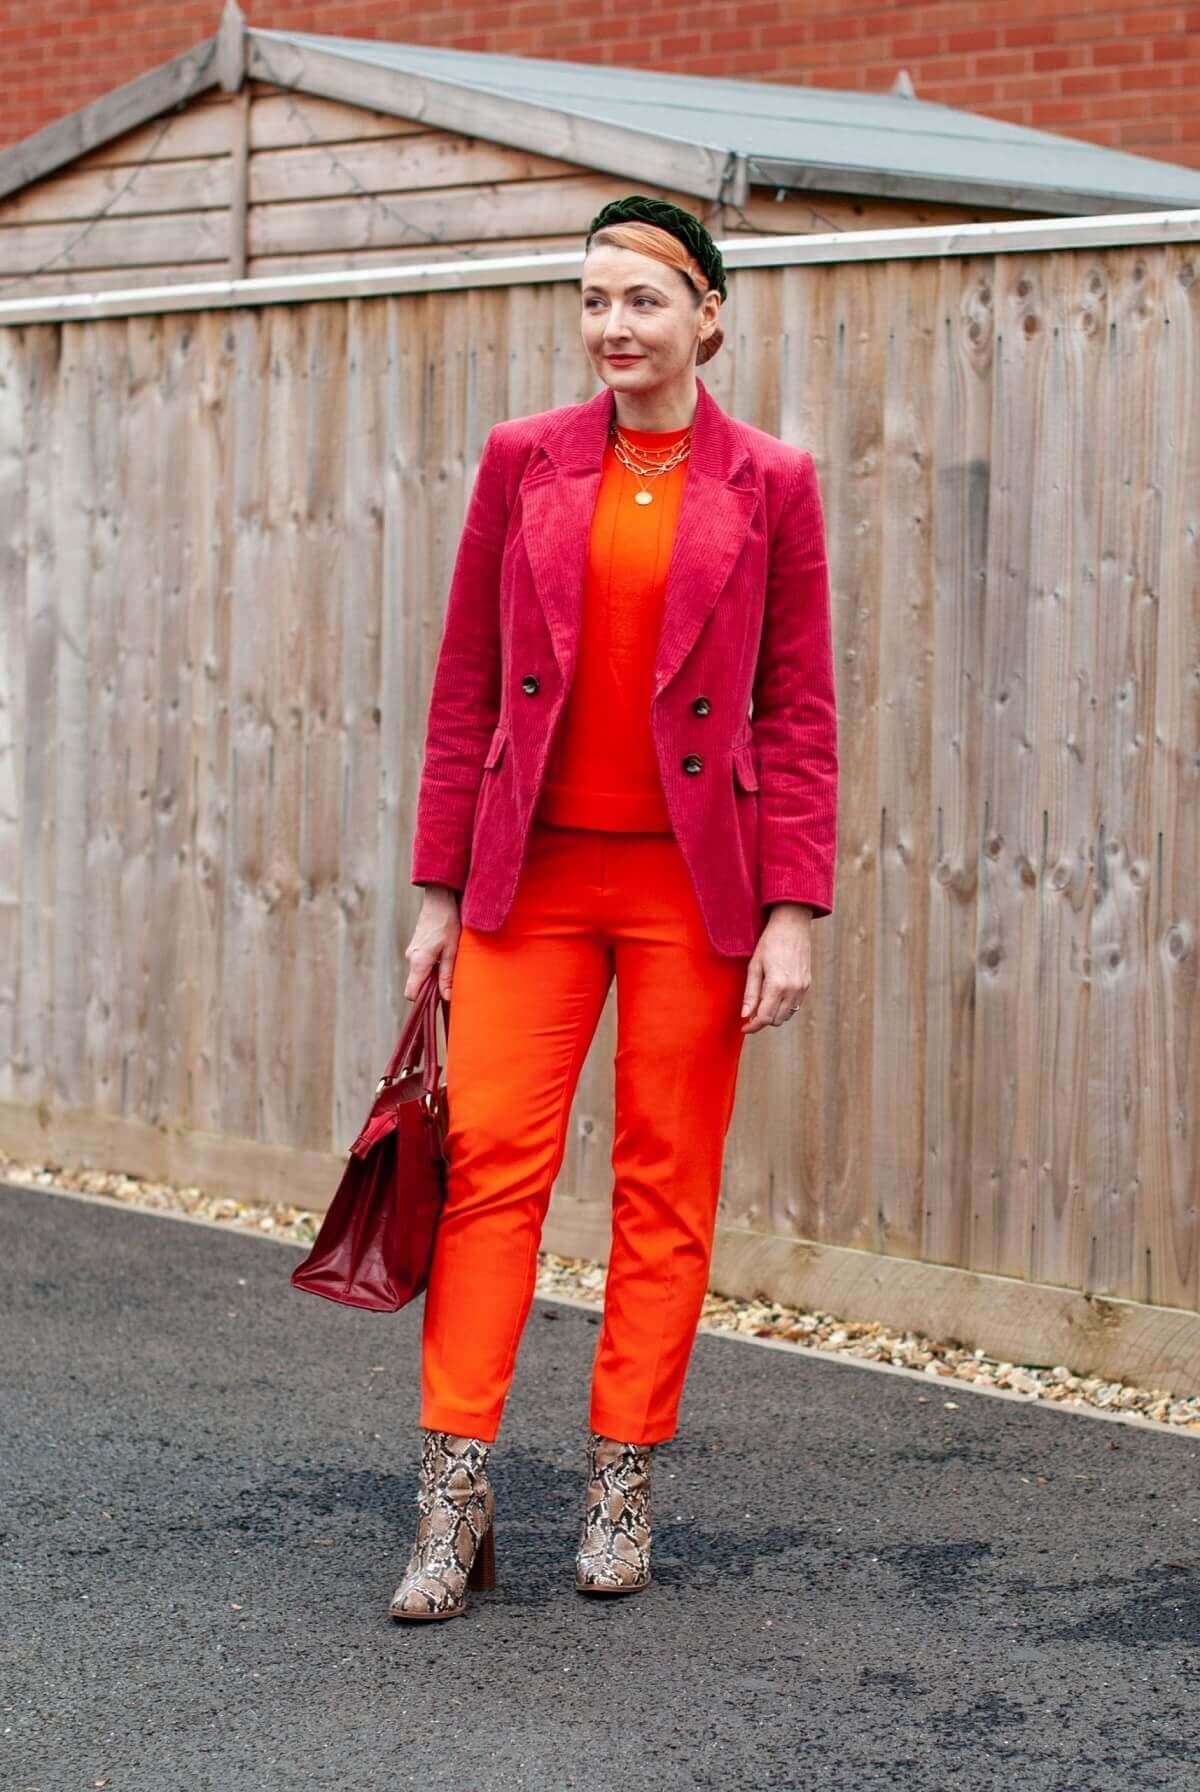 ّبا رنگ نارنجی چه رنگی بپوشیم؟